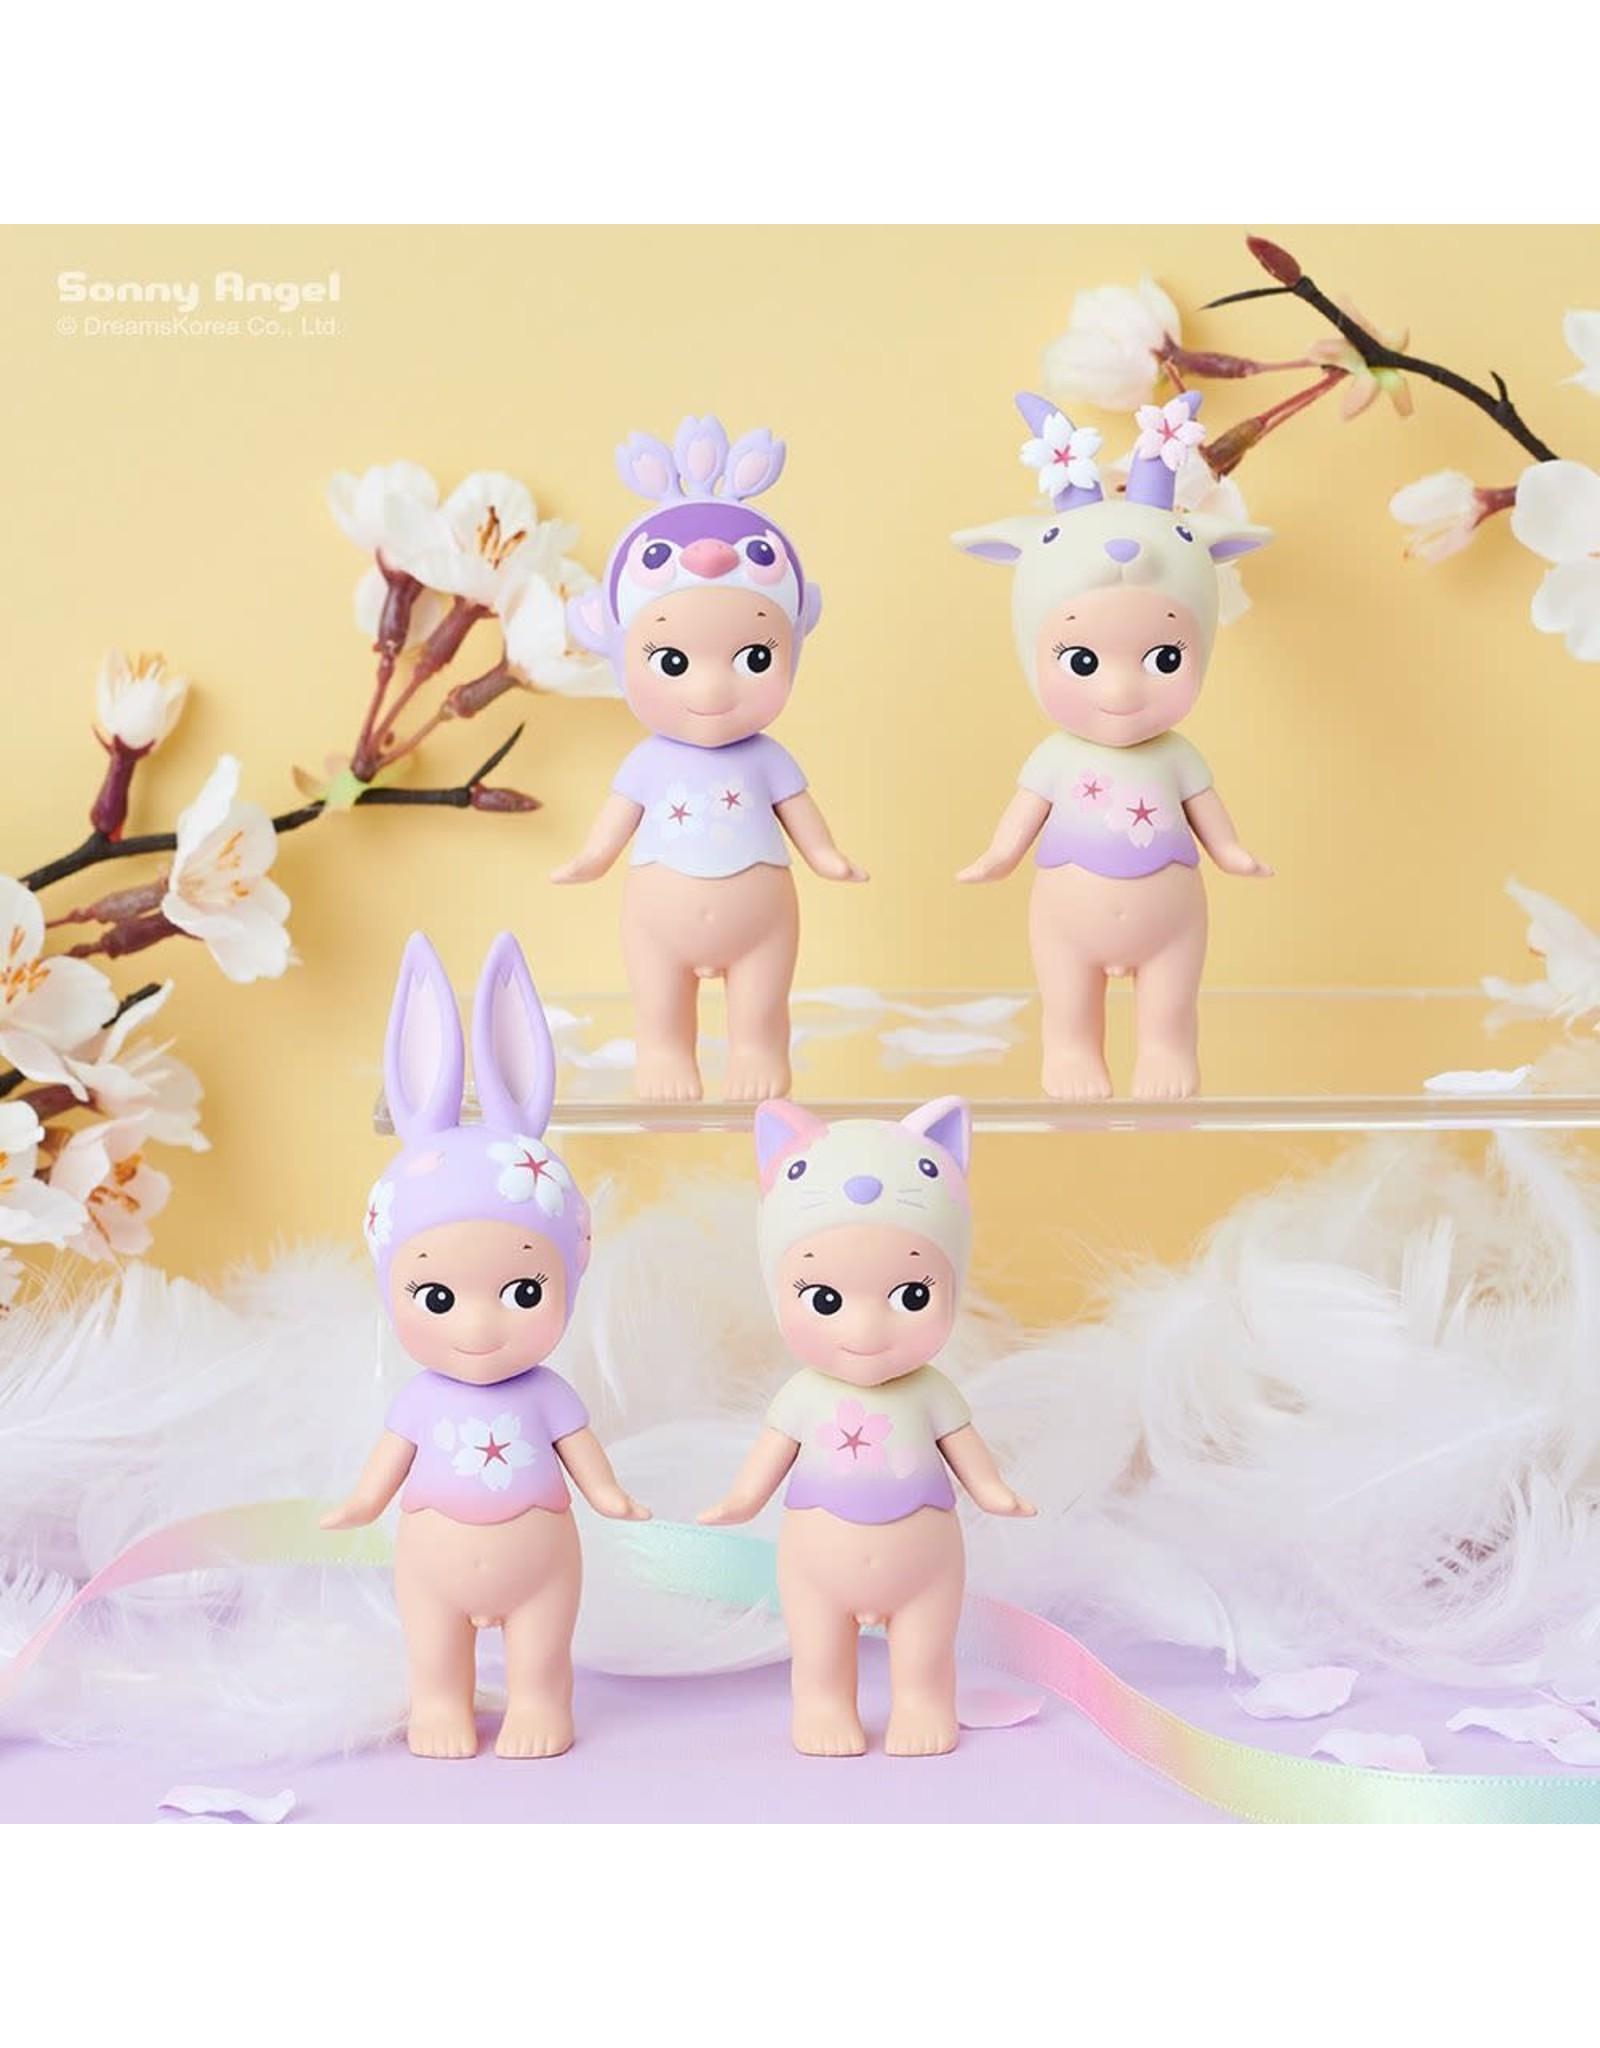 Sonny Angel Cherry Blossom - Night Version - Blind Box